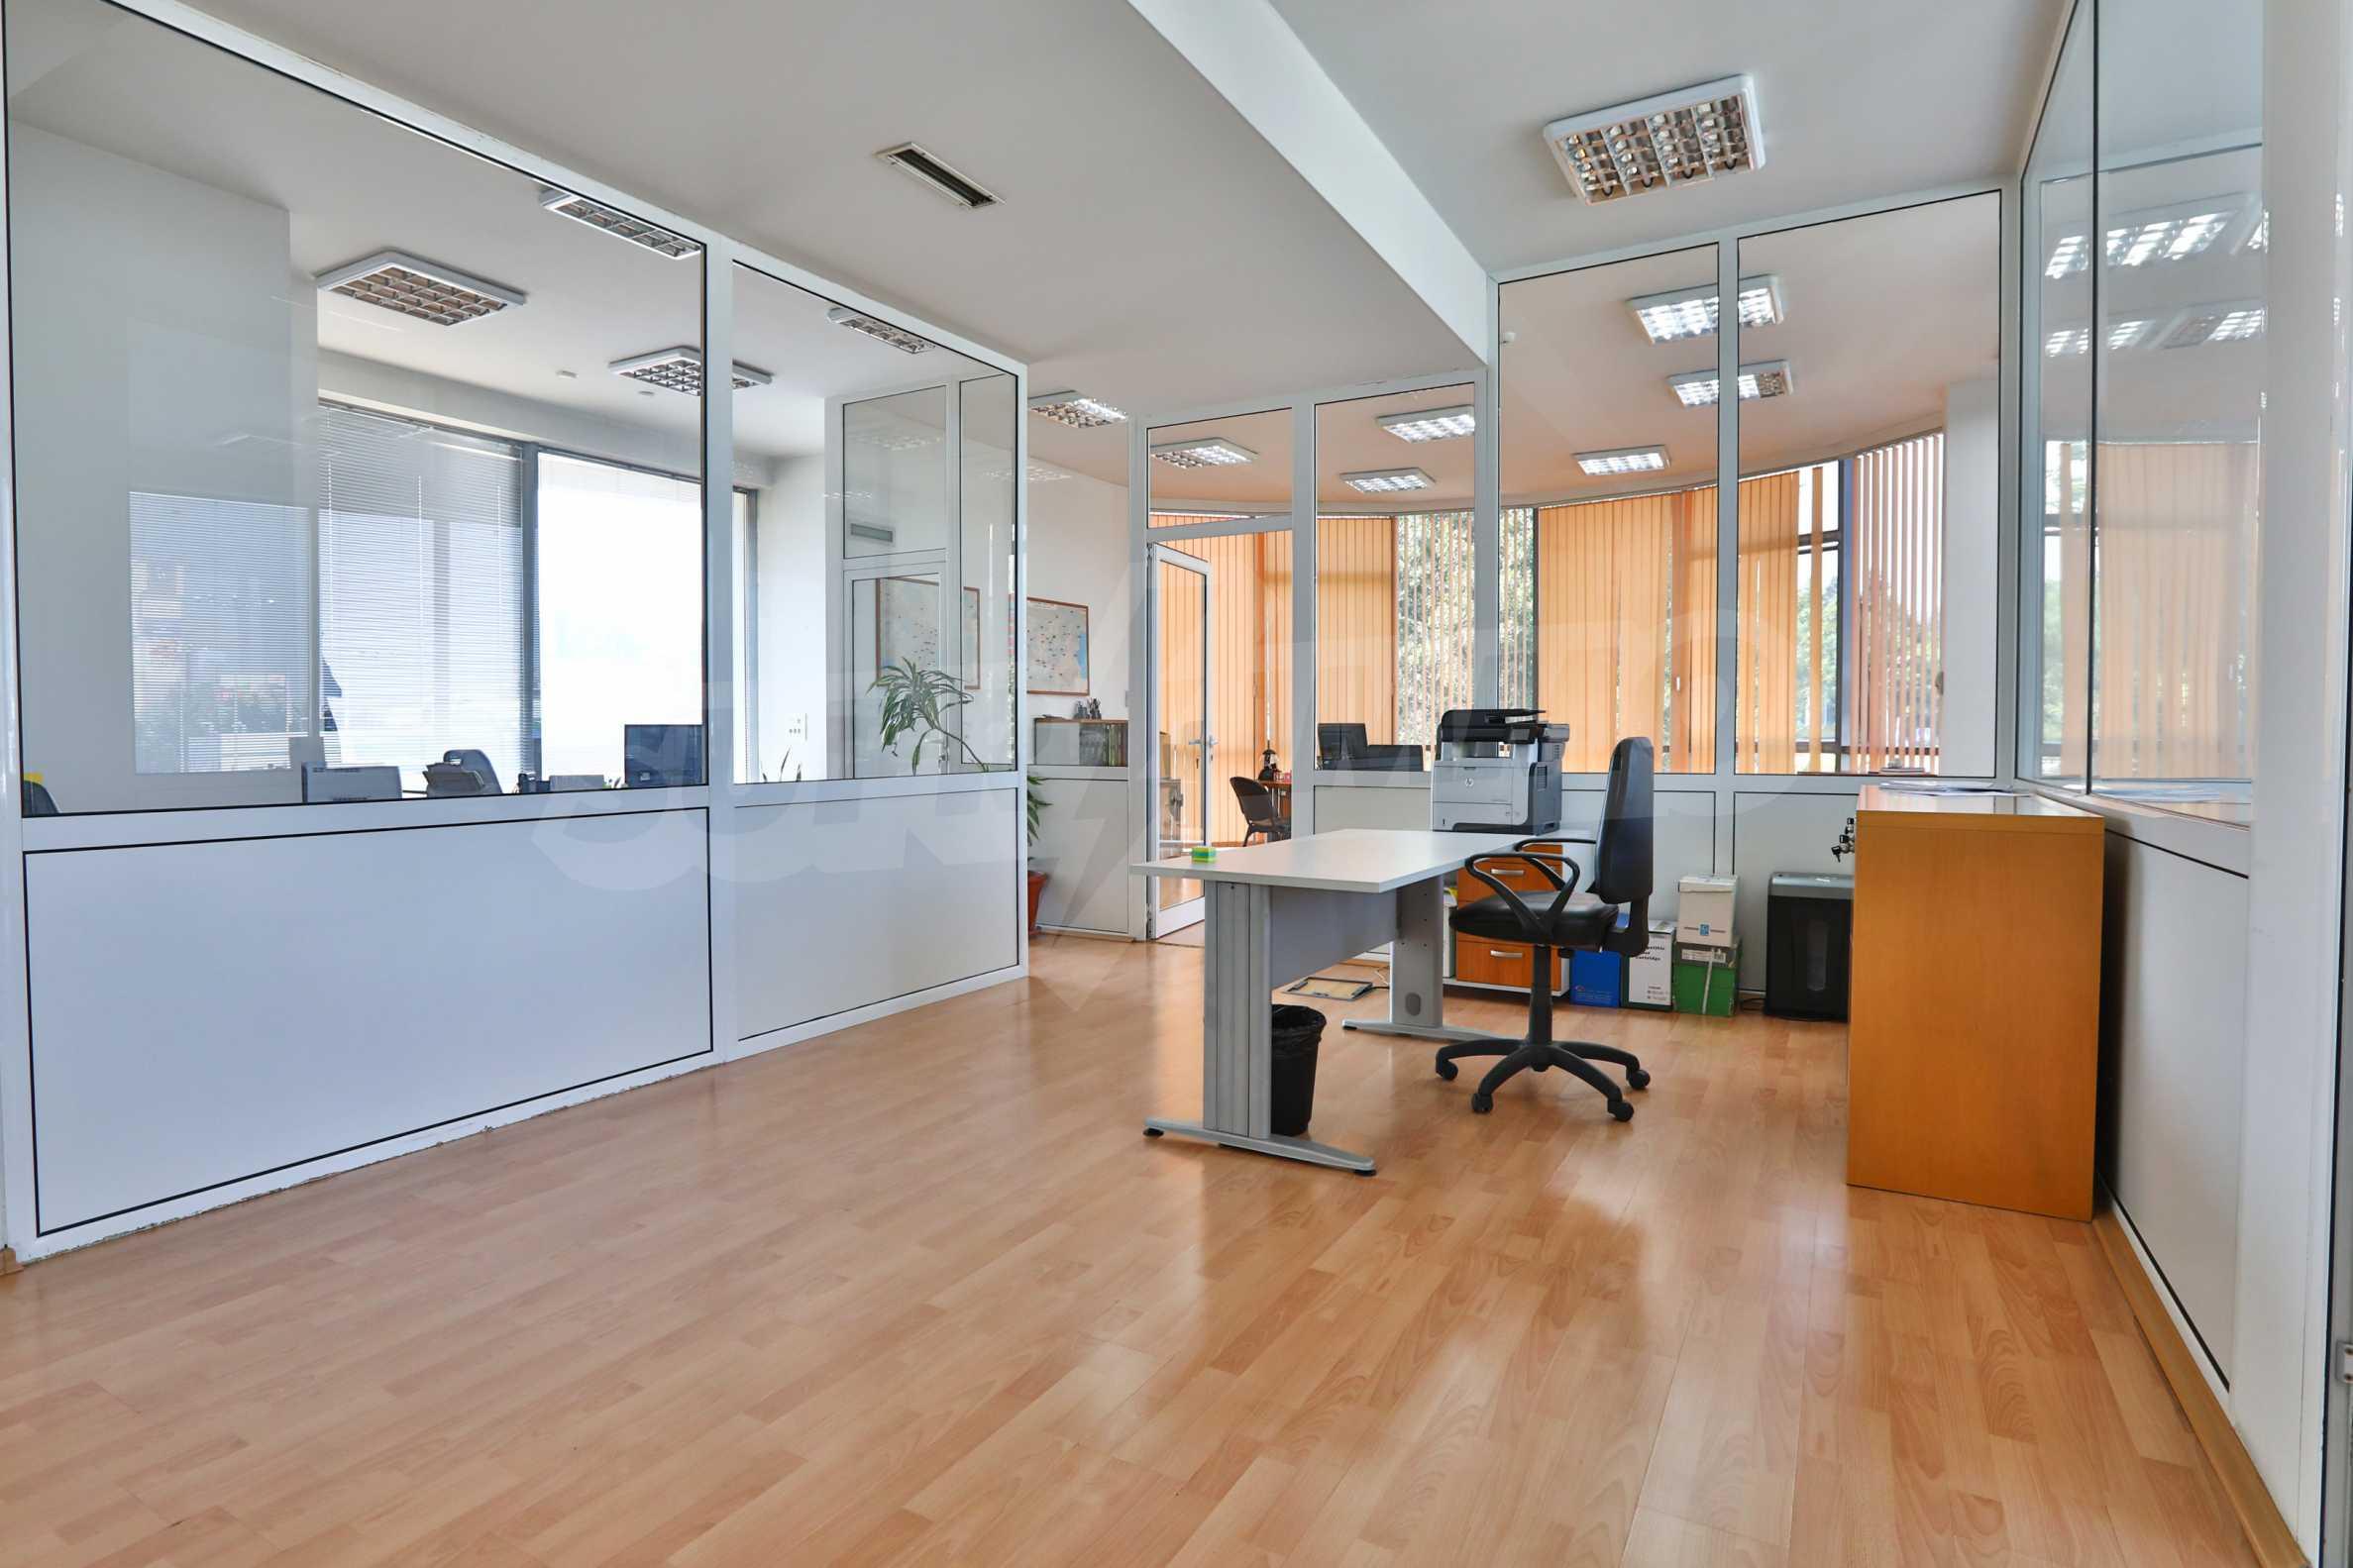 Офис в бизнес сграда висок клас на бул. Цариградско шосе 36